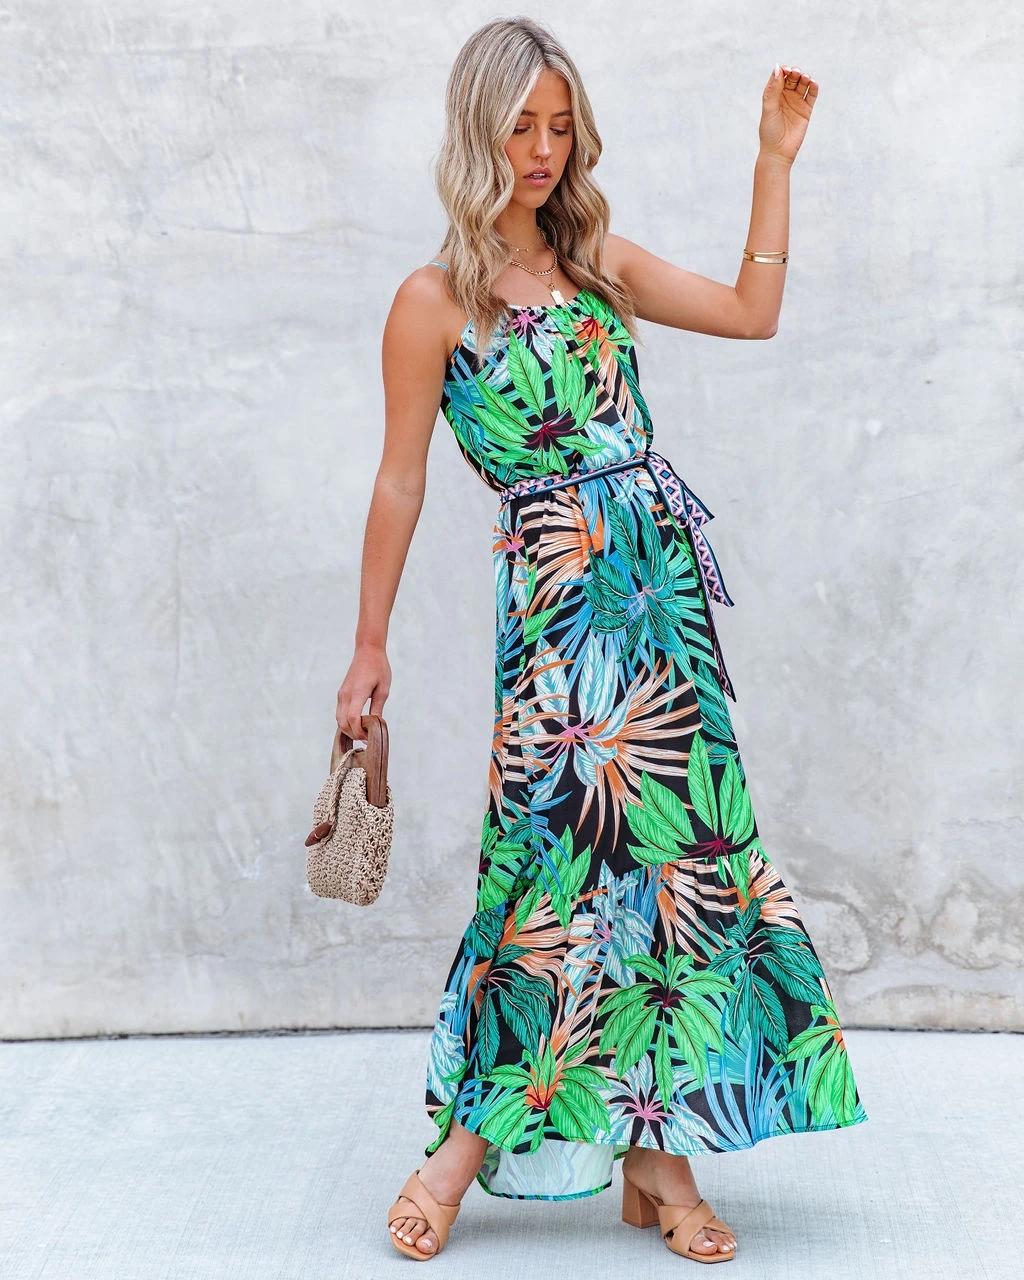 nihaostyle clothing wholesale new style print big-line ruffled suspender dress NSOUY67381